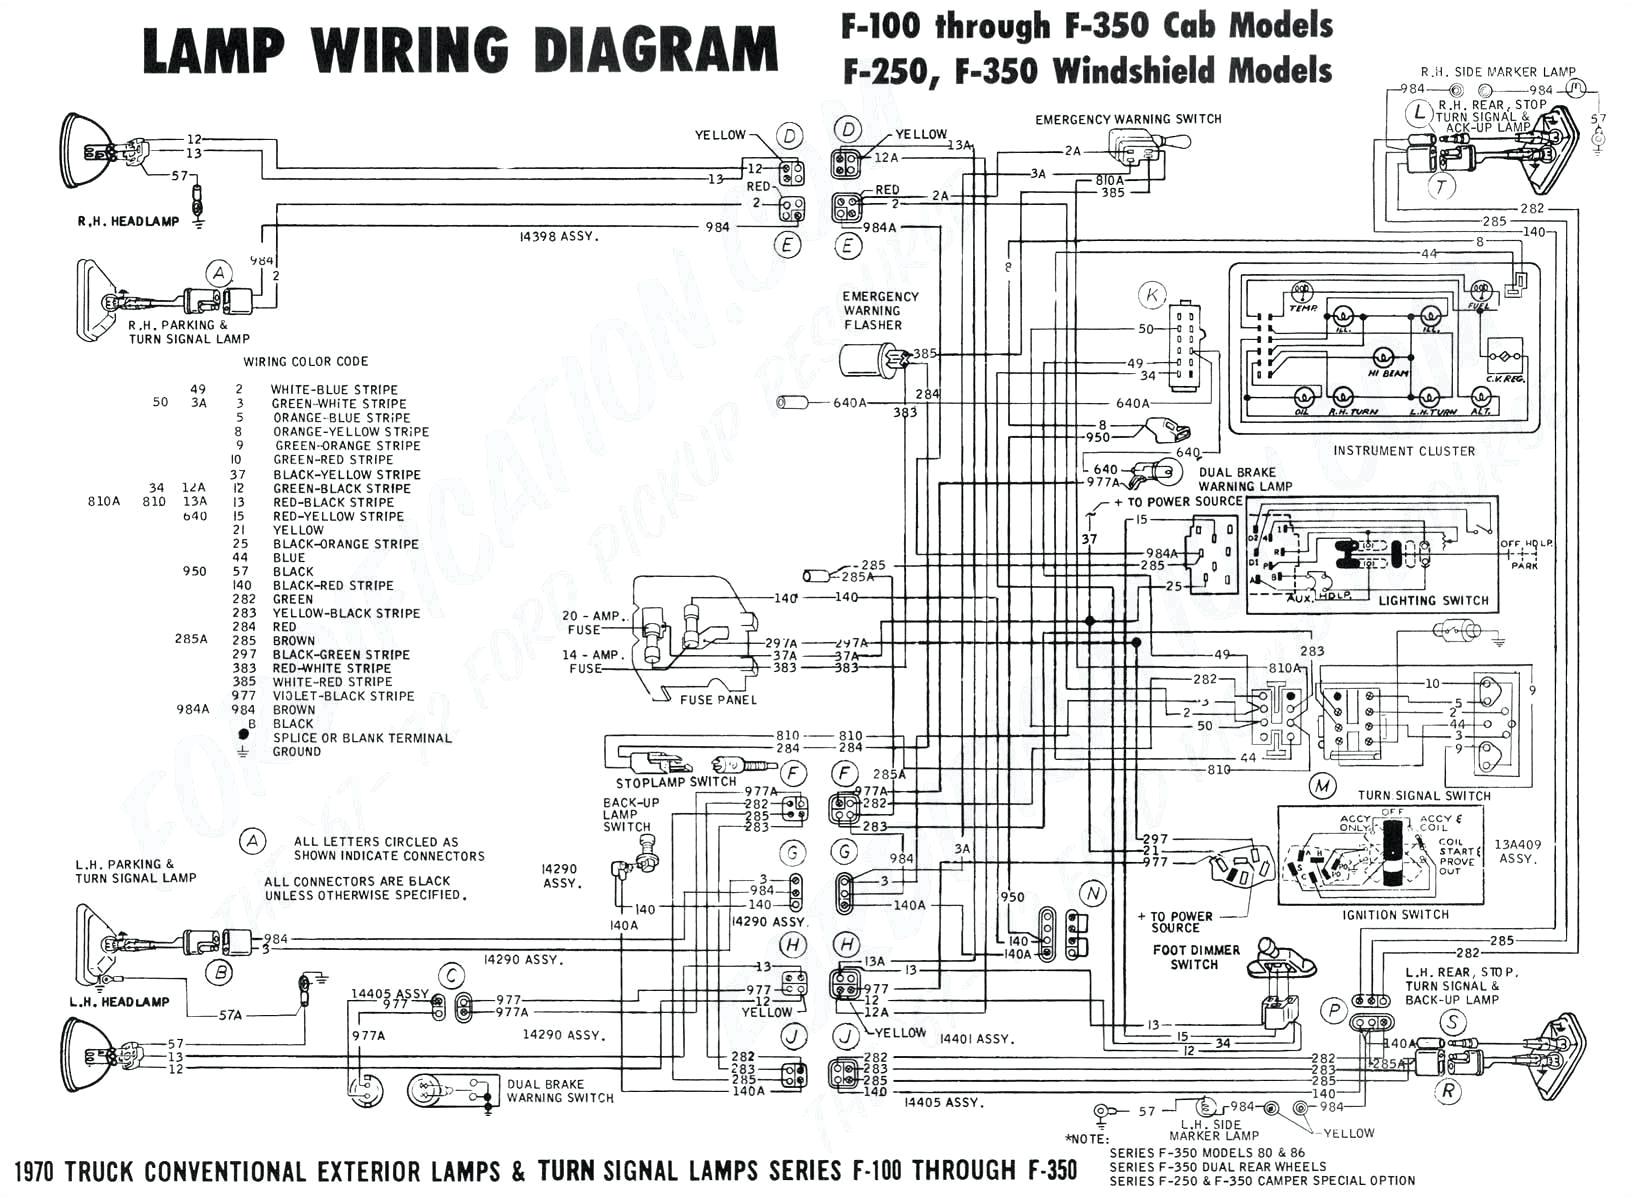 case 1840 wiring diagram wiring diagram showcase 1840 wiring diagram wiring diagram case 1840 wiring diagram